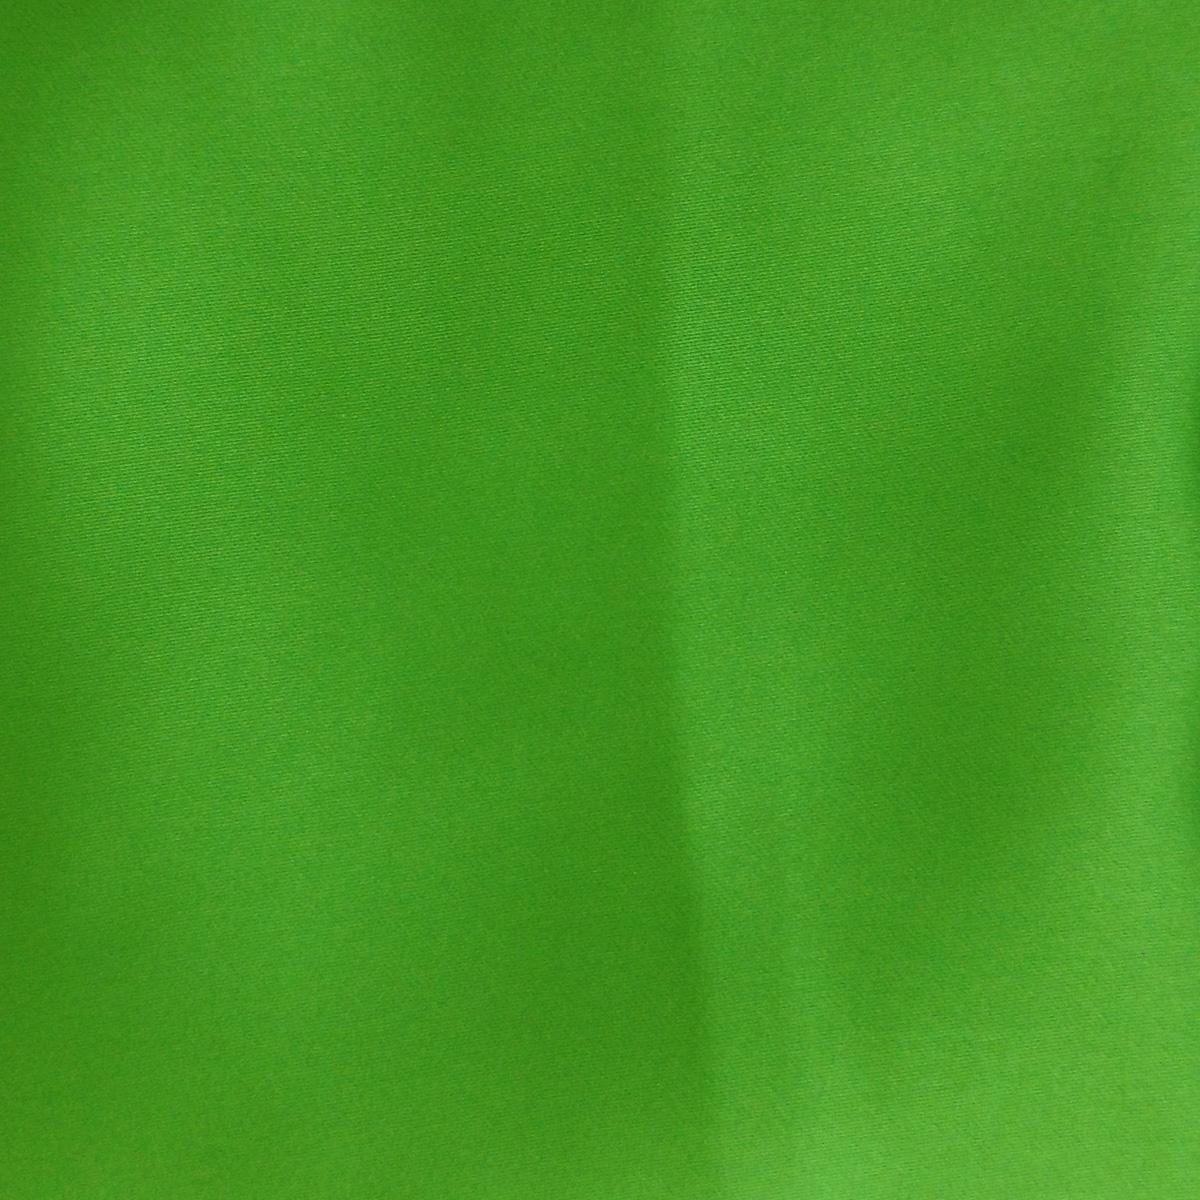 B1764 14 grass mens ties facemasks con murphys menswear cork - - Con Murphys Menswear